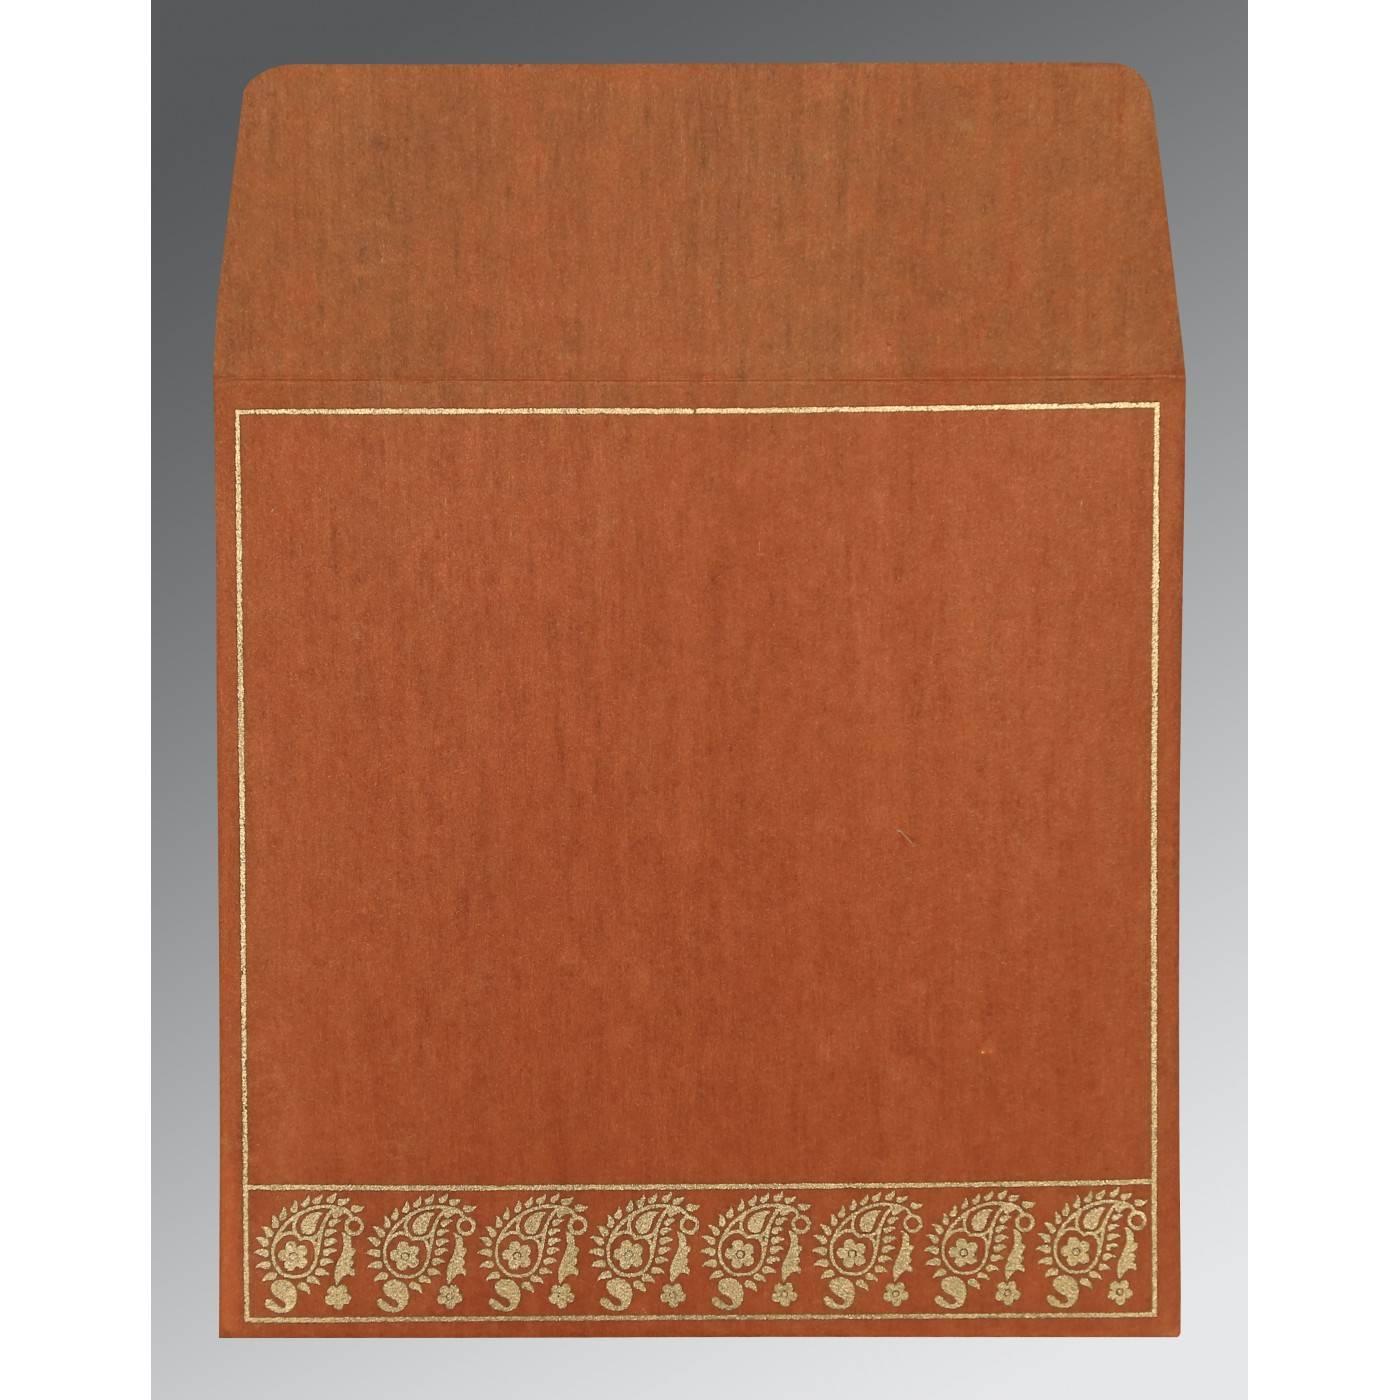 BURNT ORANGE WOOLY FLORAL THEMED - SCREEN PRINTED WEDDING CARD : CW-8218C - IndianWeddingCards